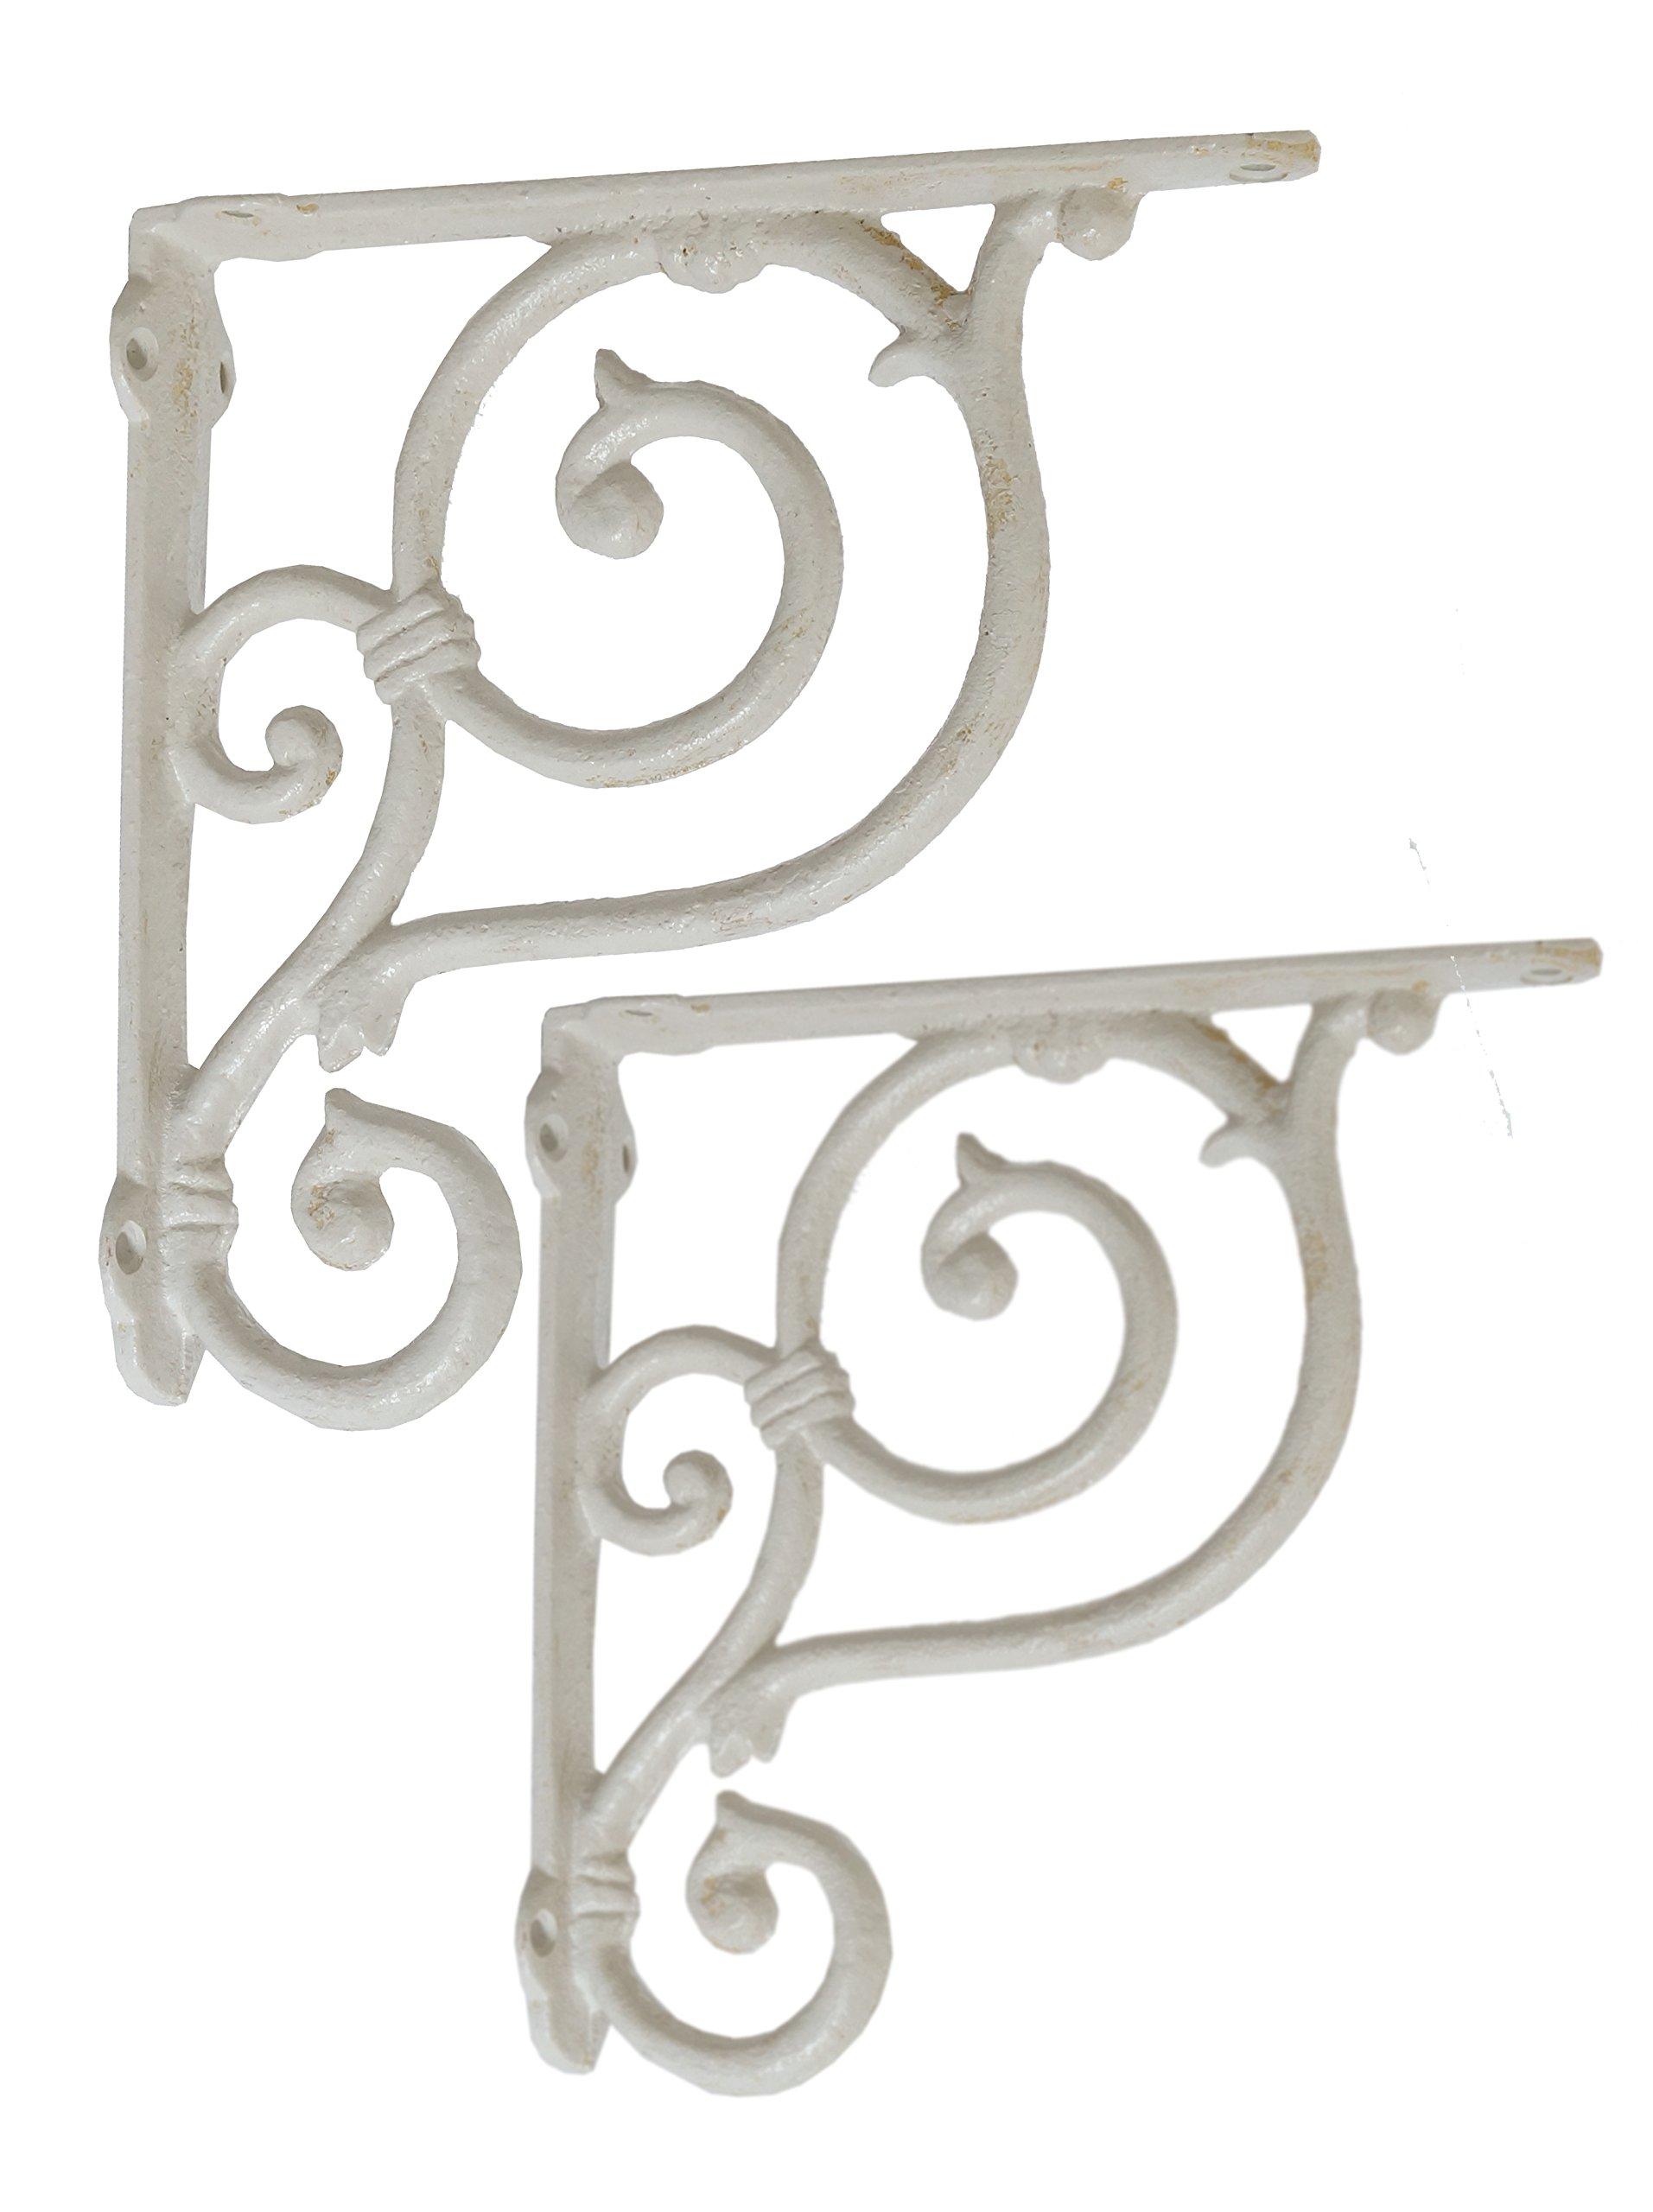 NACH js-90-059AW Decorative Shelf Bracket (Pack of 2), Medium, White (7.5x7.5x1.49 inches)